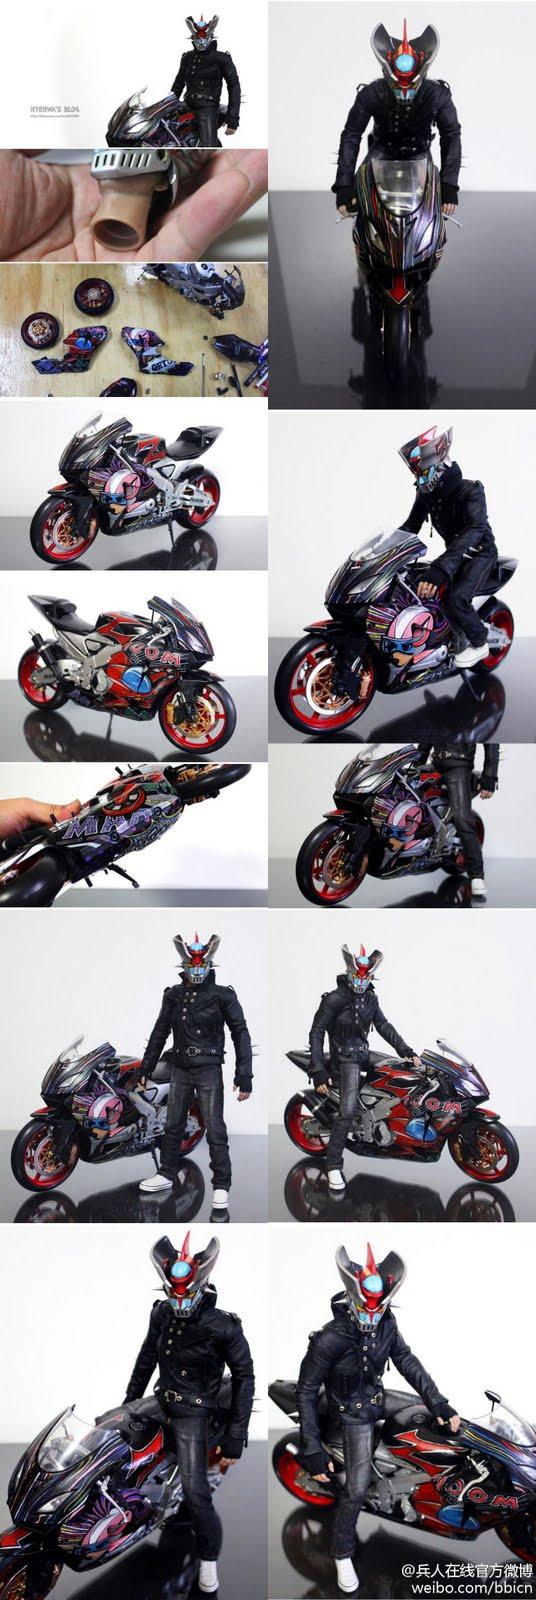 http://3.bp.blogspot.com/-uJvtadX1uaw/TsU967hI2qI/AAAAAAAAK0U/6BYd9LzfI_k/s1600/Mazinger-rider.jpg